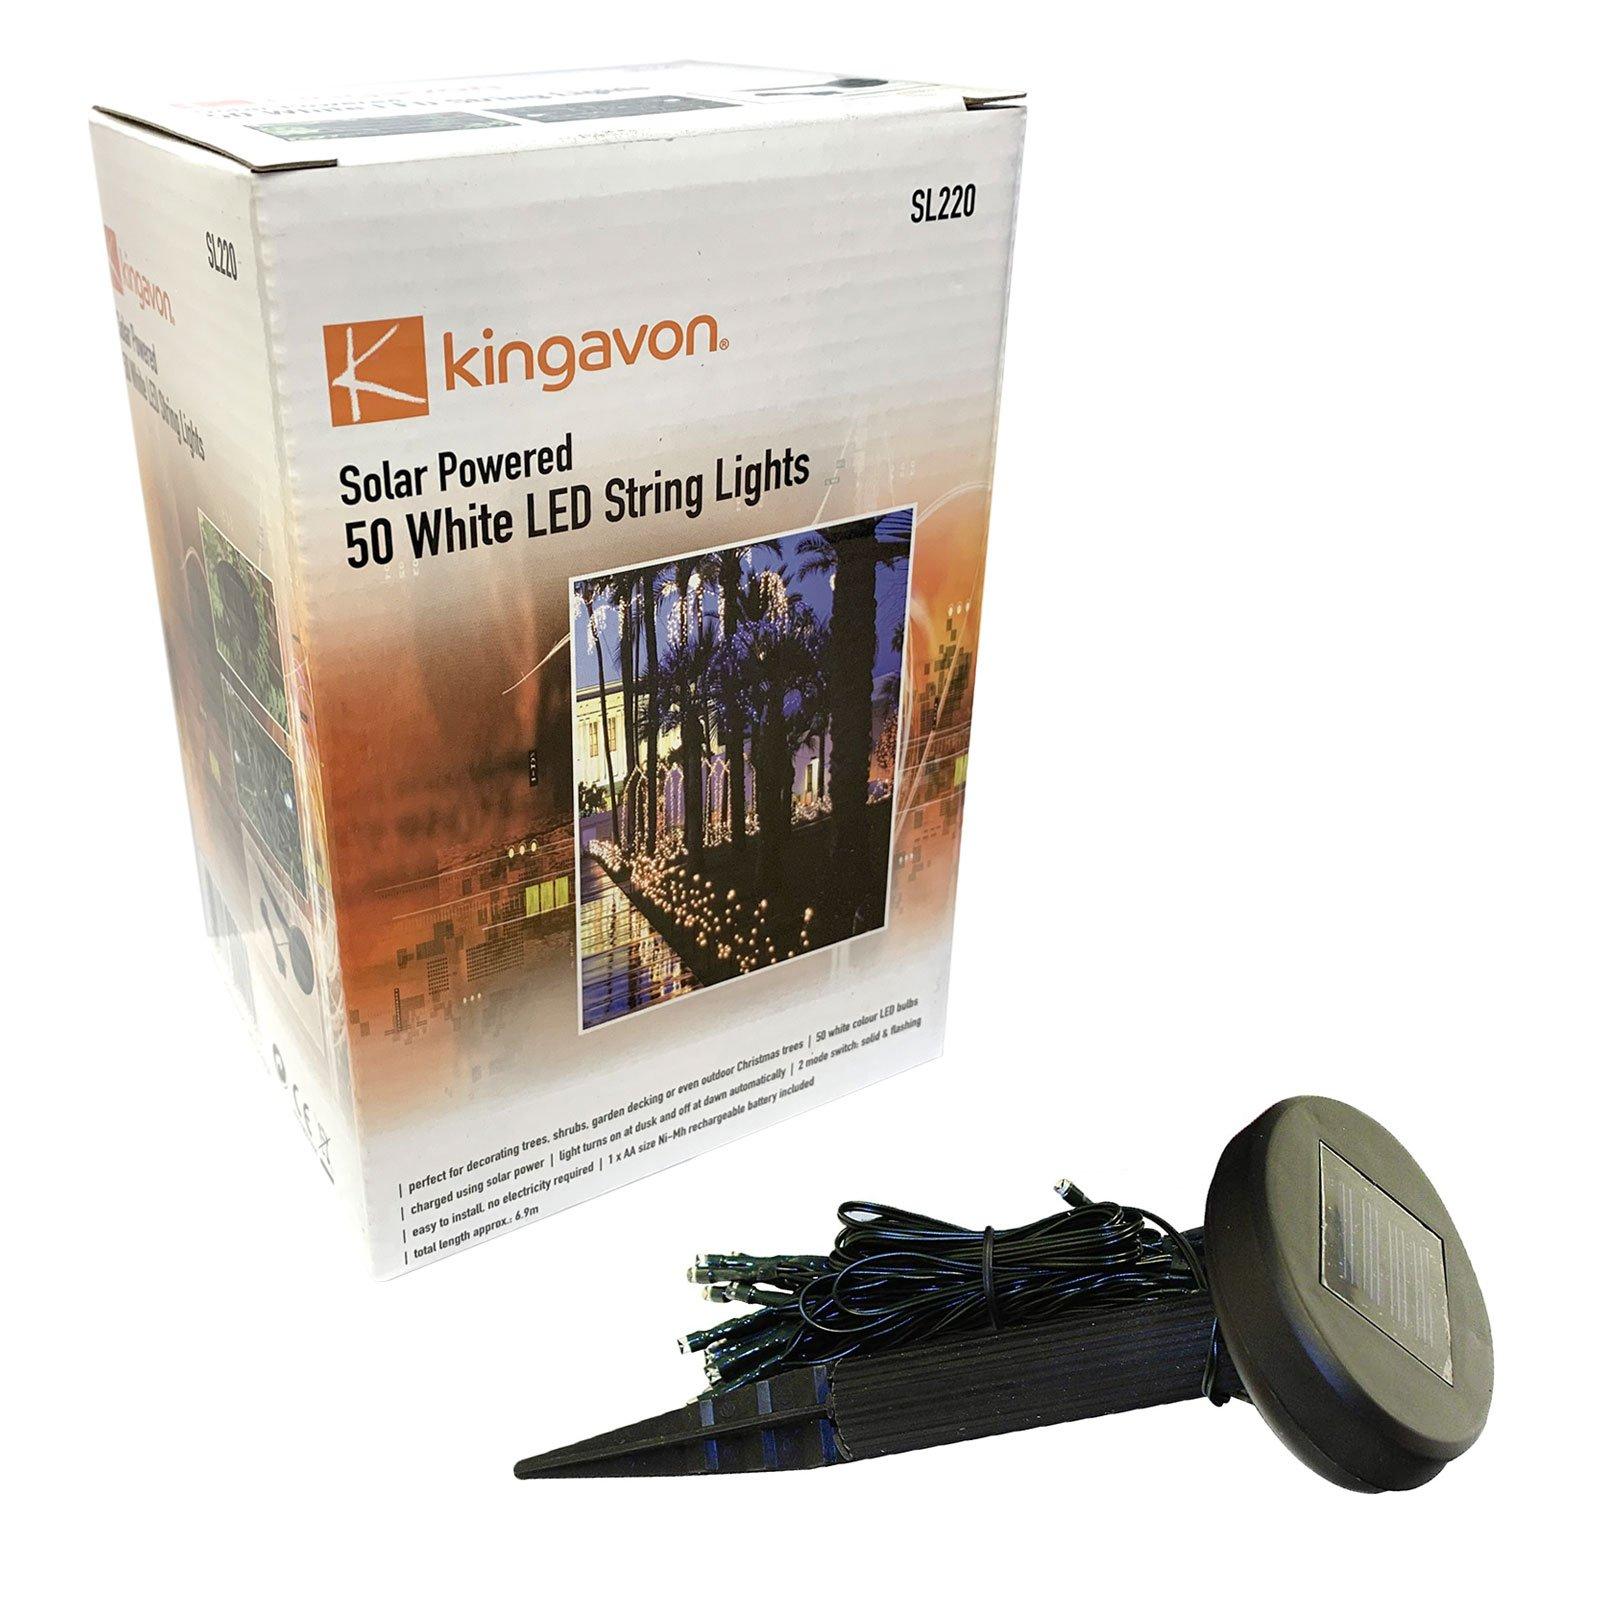 Kingavon solar powered 50 white LED string lights free at Amos